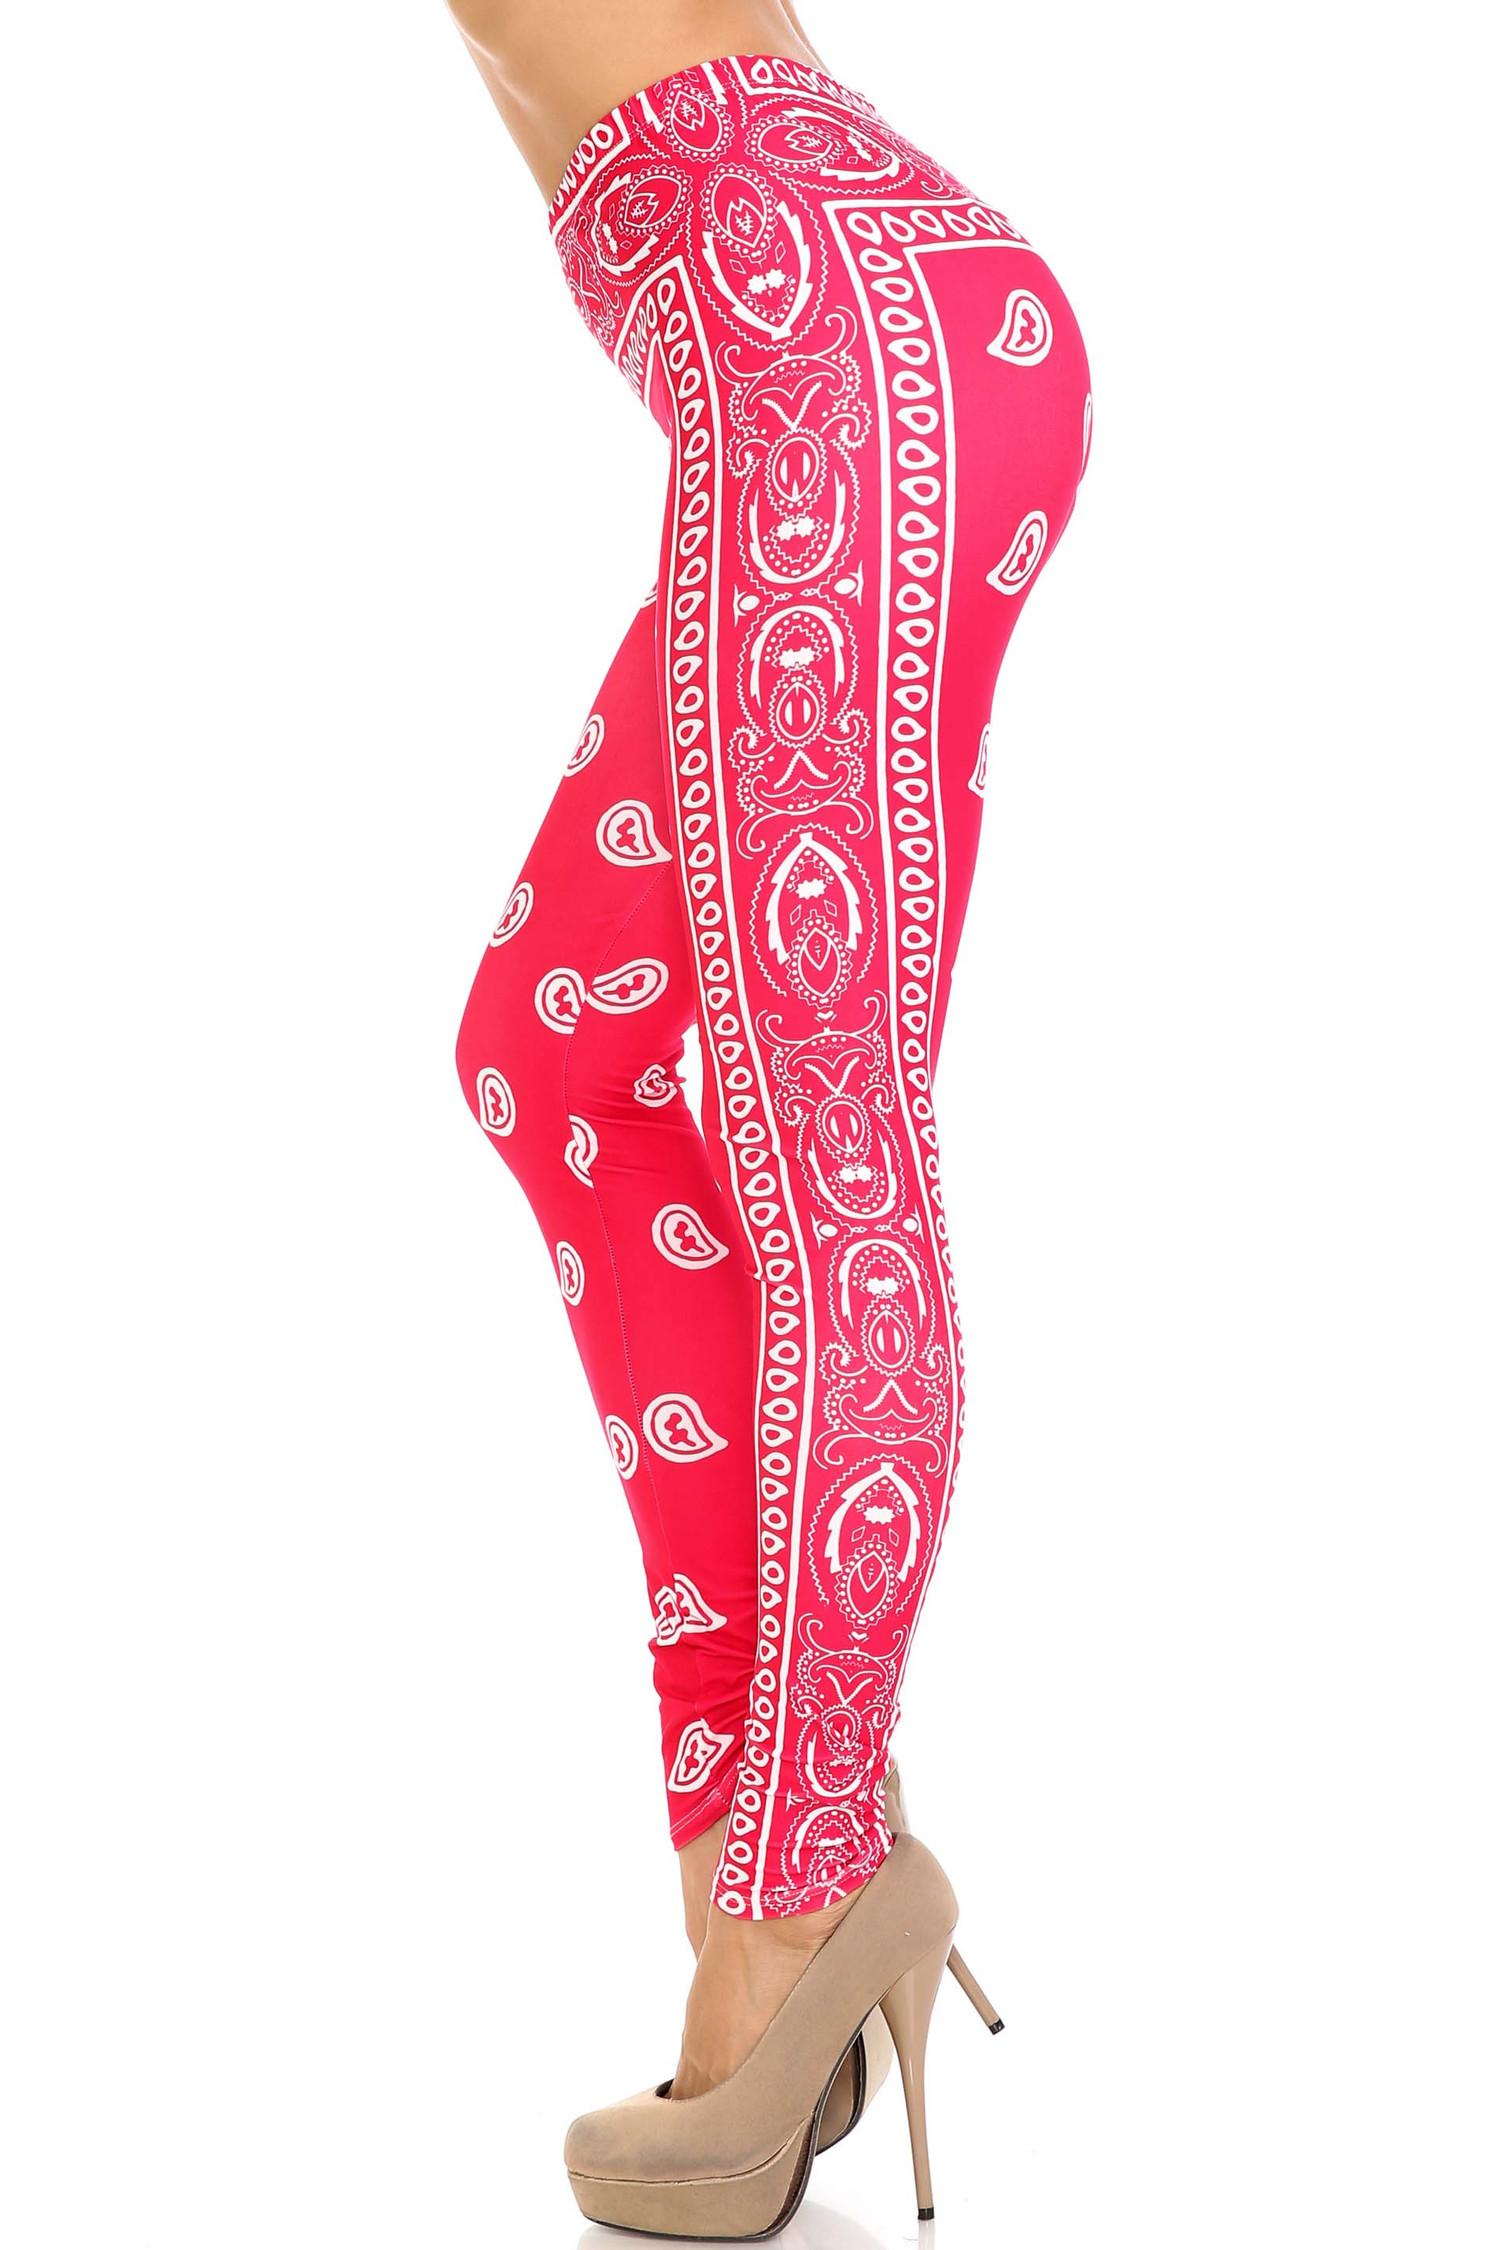 Creamy Soft Red Bandana Leggings - USA Fashion™